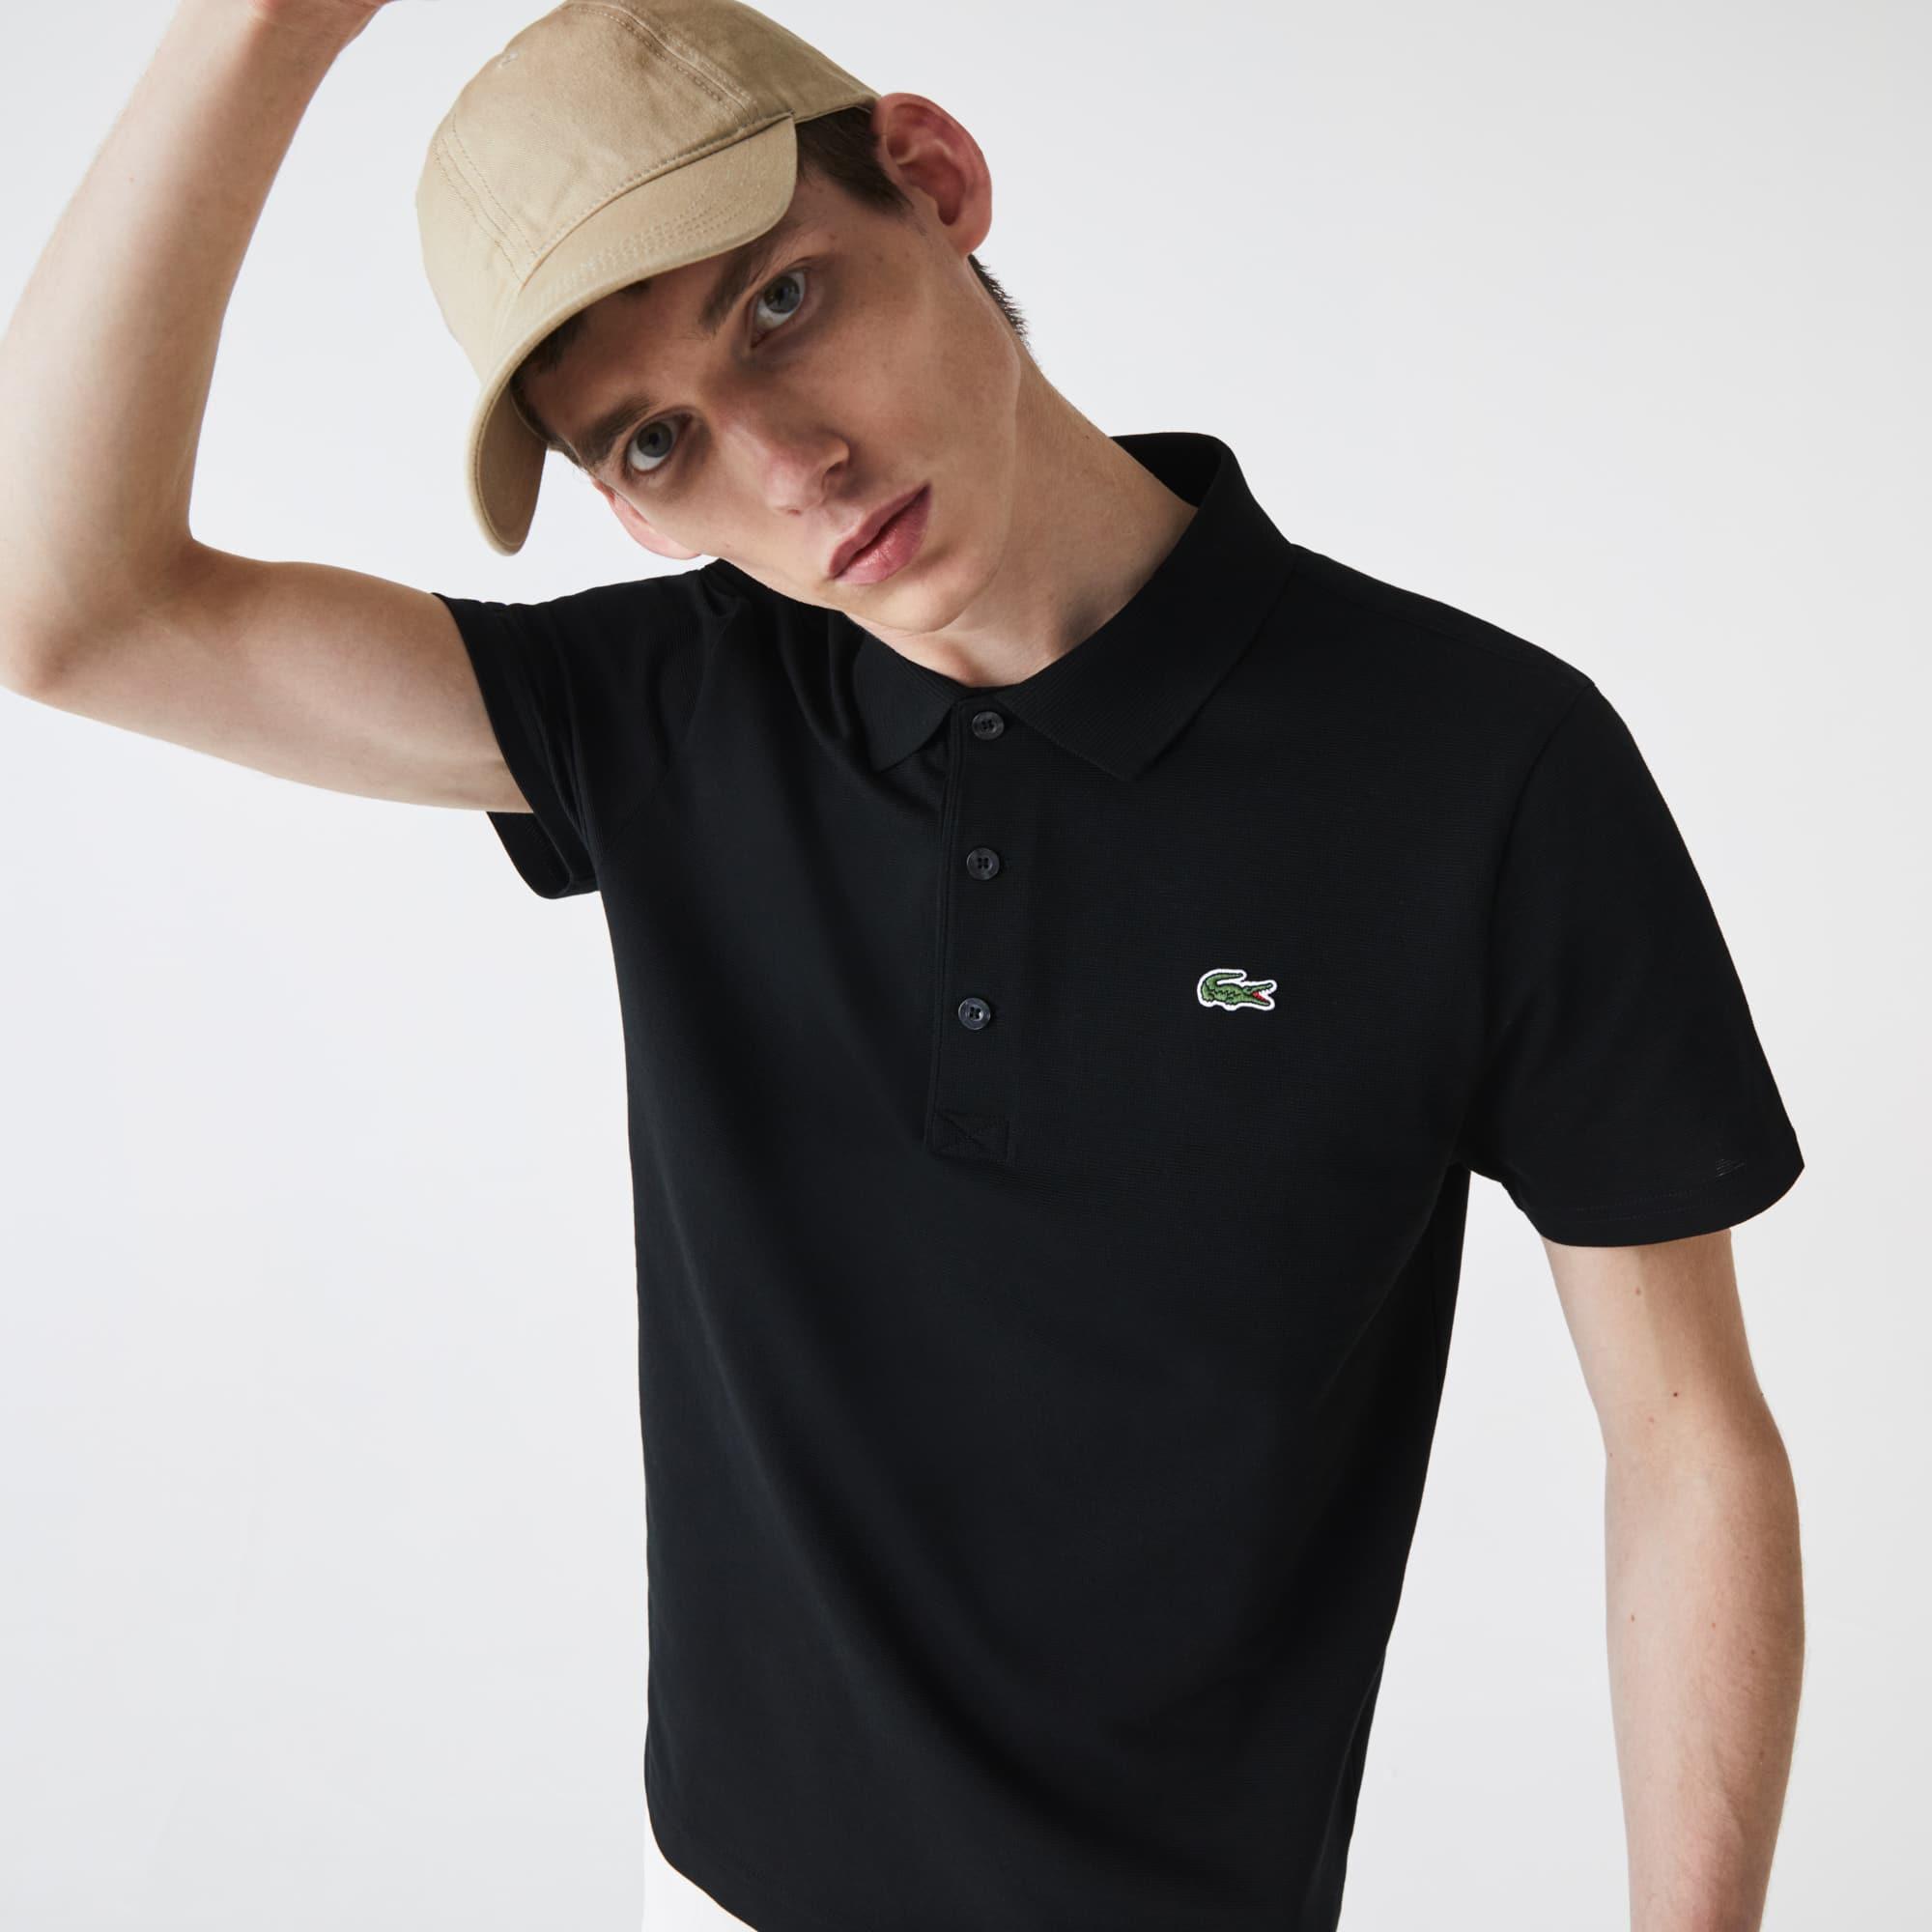 Men's Lacoste SPORT Tennis Ultra-Light Cotton Knit Polo Shirt